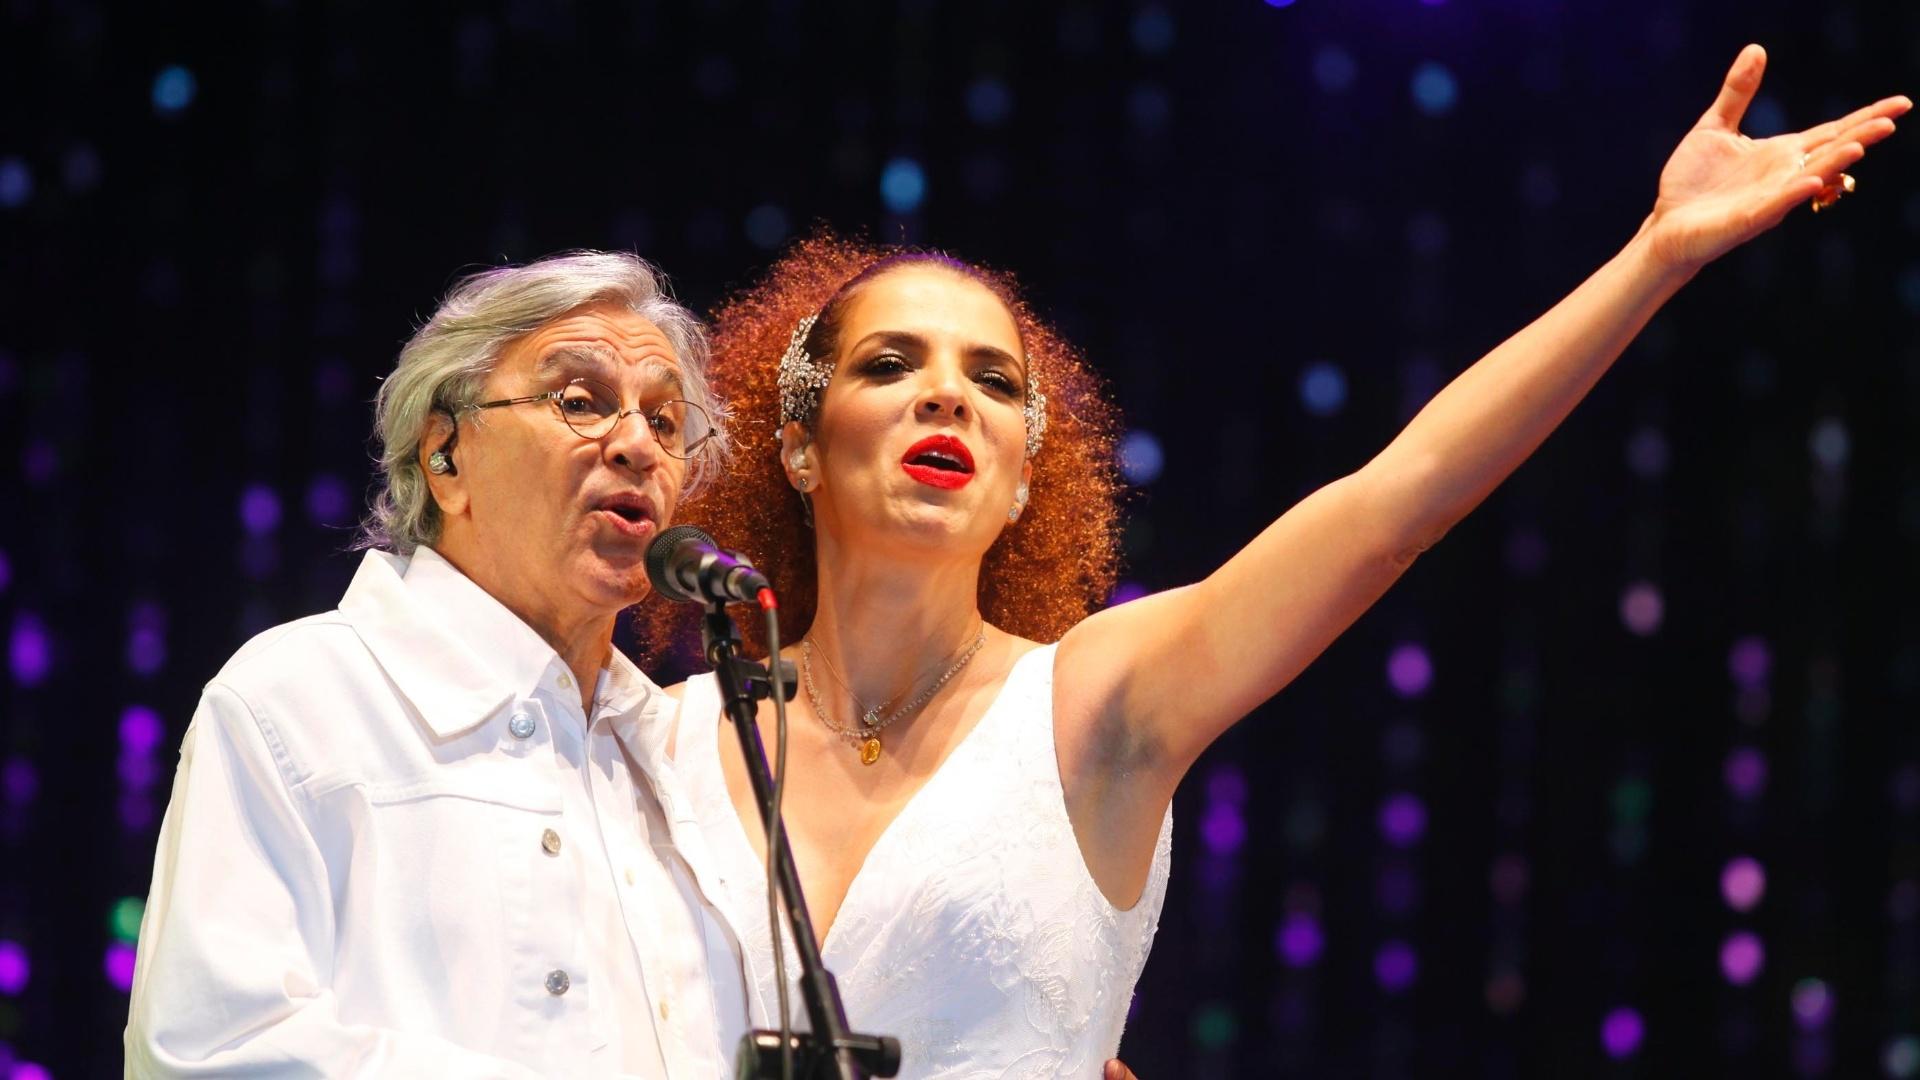 9.jun.2013 - Vanesssa da Mata canta com Caetano Veloso durante show na praia de Ipanema, no Rio de Janeiro